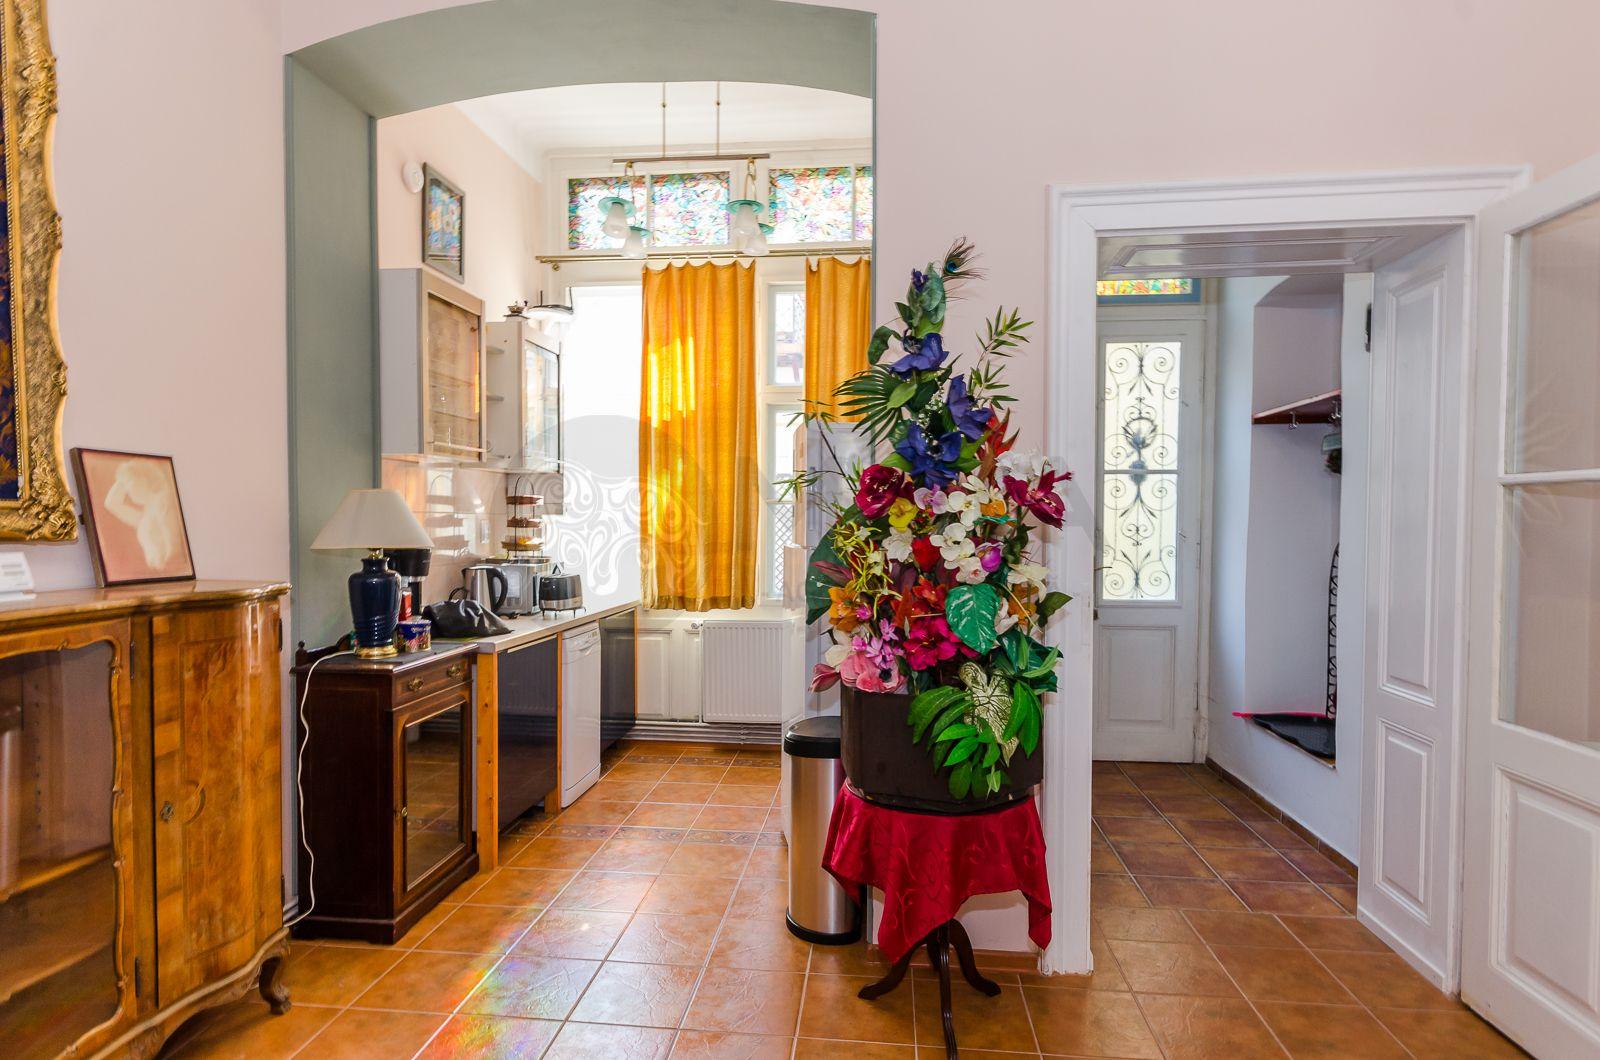 Apartament 5 camere situat CENTRAL (Alexandru Xenopol) ,116 mp teren